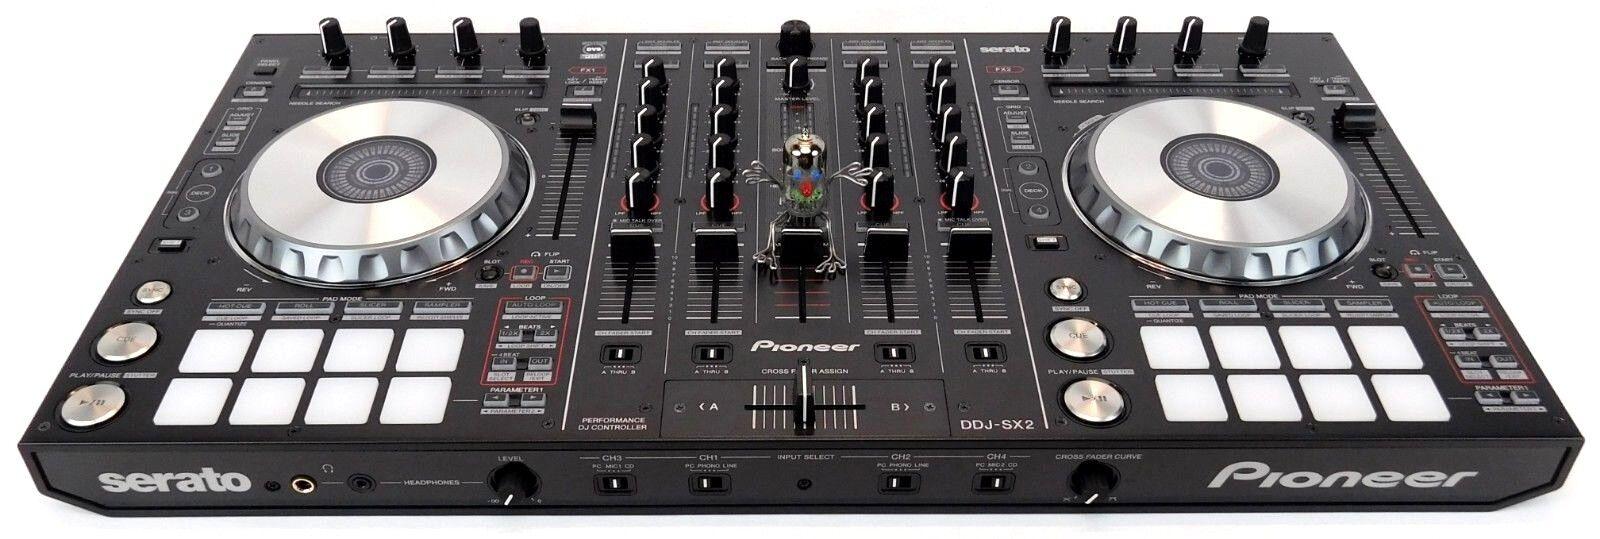 Pioneer DDJ-SX2 Serato DJ Controller Mixer +Fast Neuwertig OVP+ 1.5J Garantie